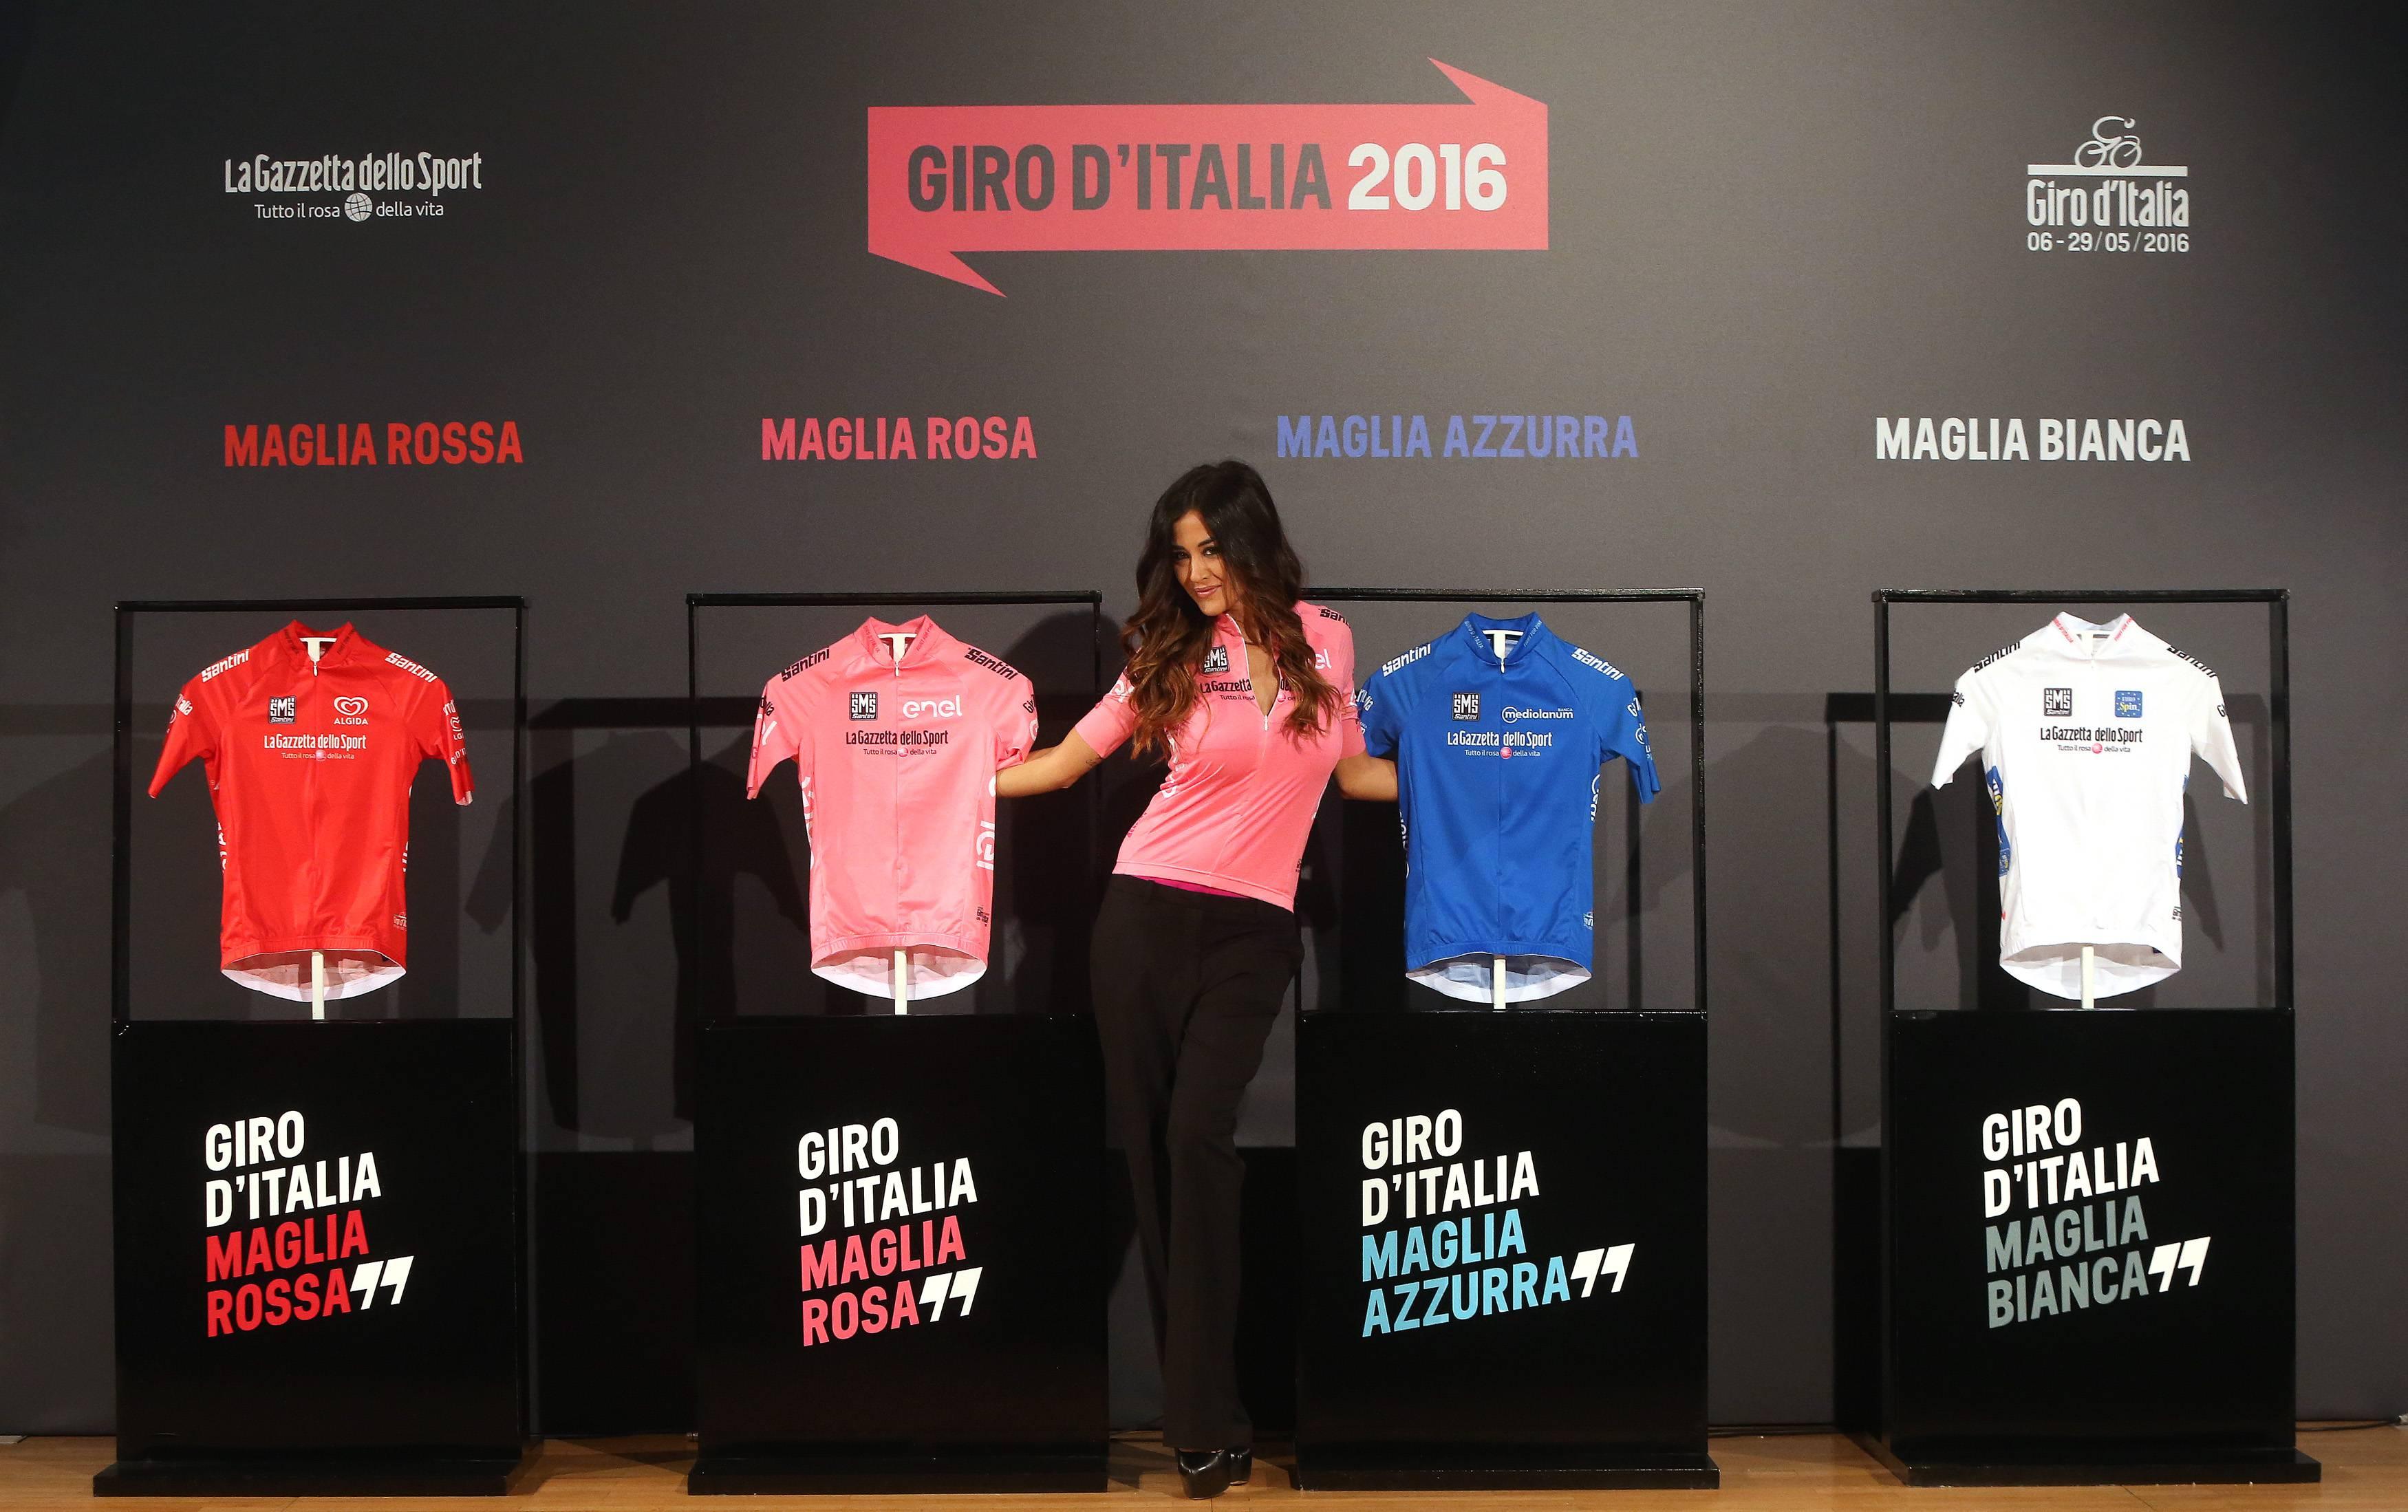 maglie giro d'italia 2016